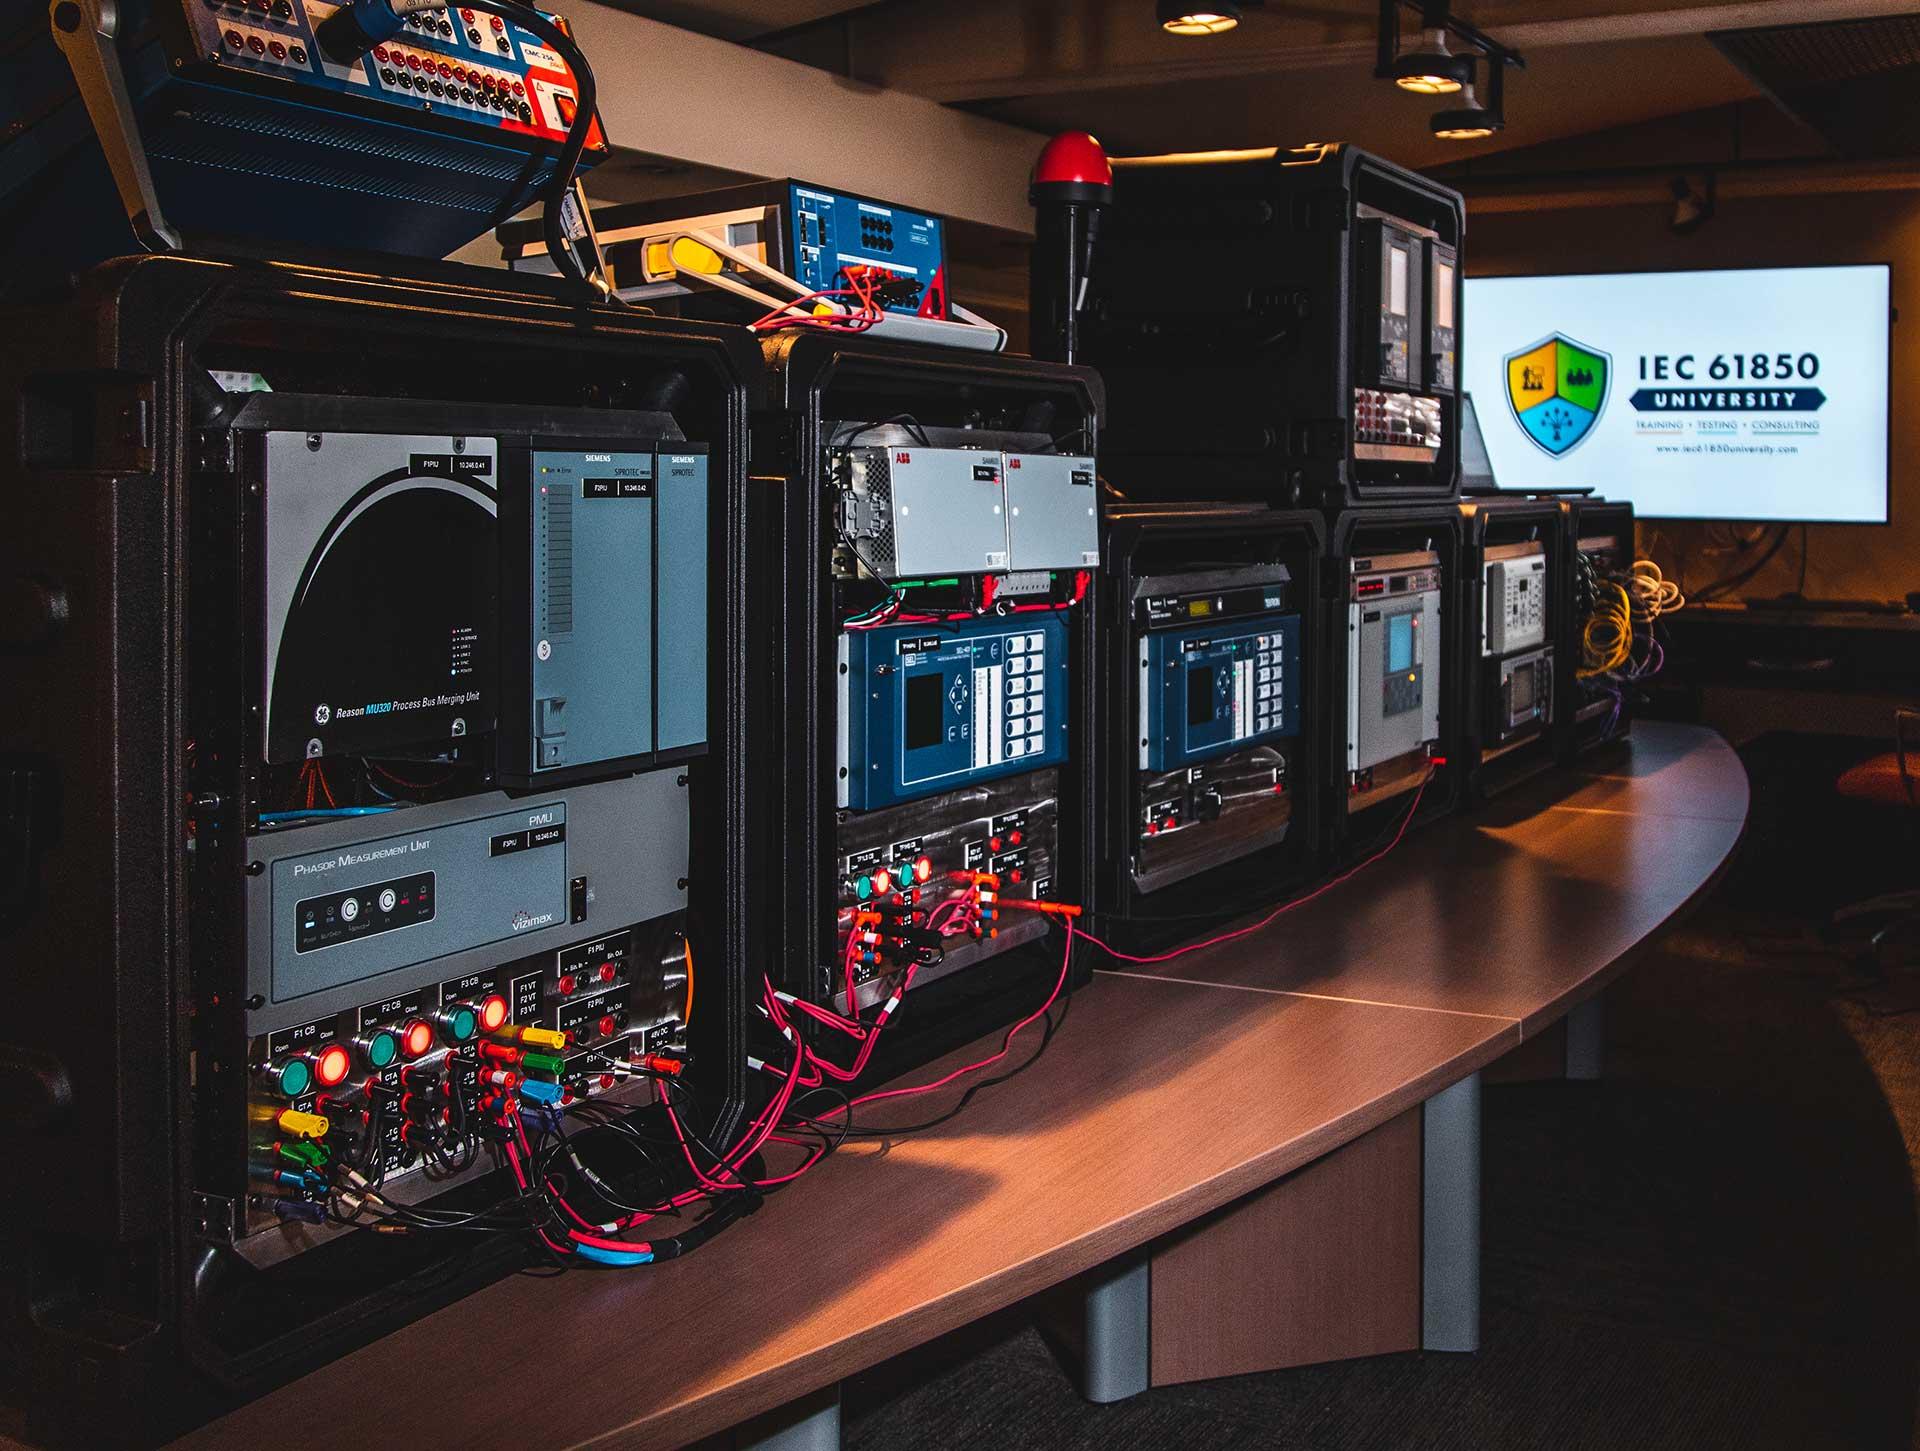 IEC 61850 University - Mobile Digital Substation